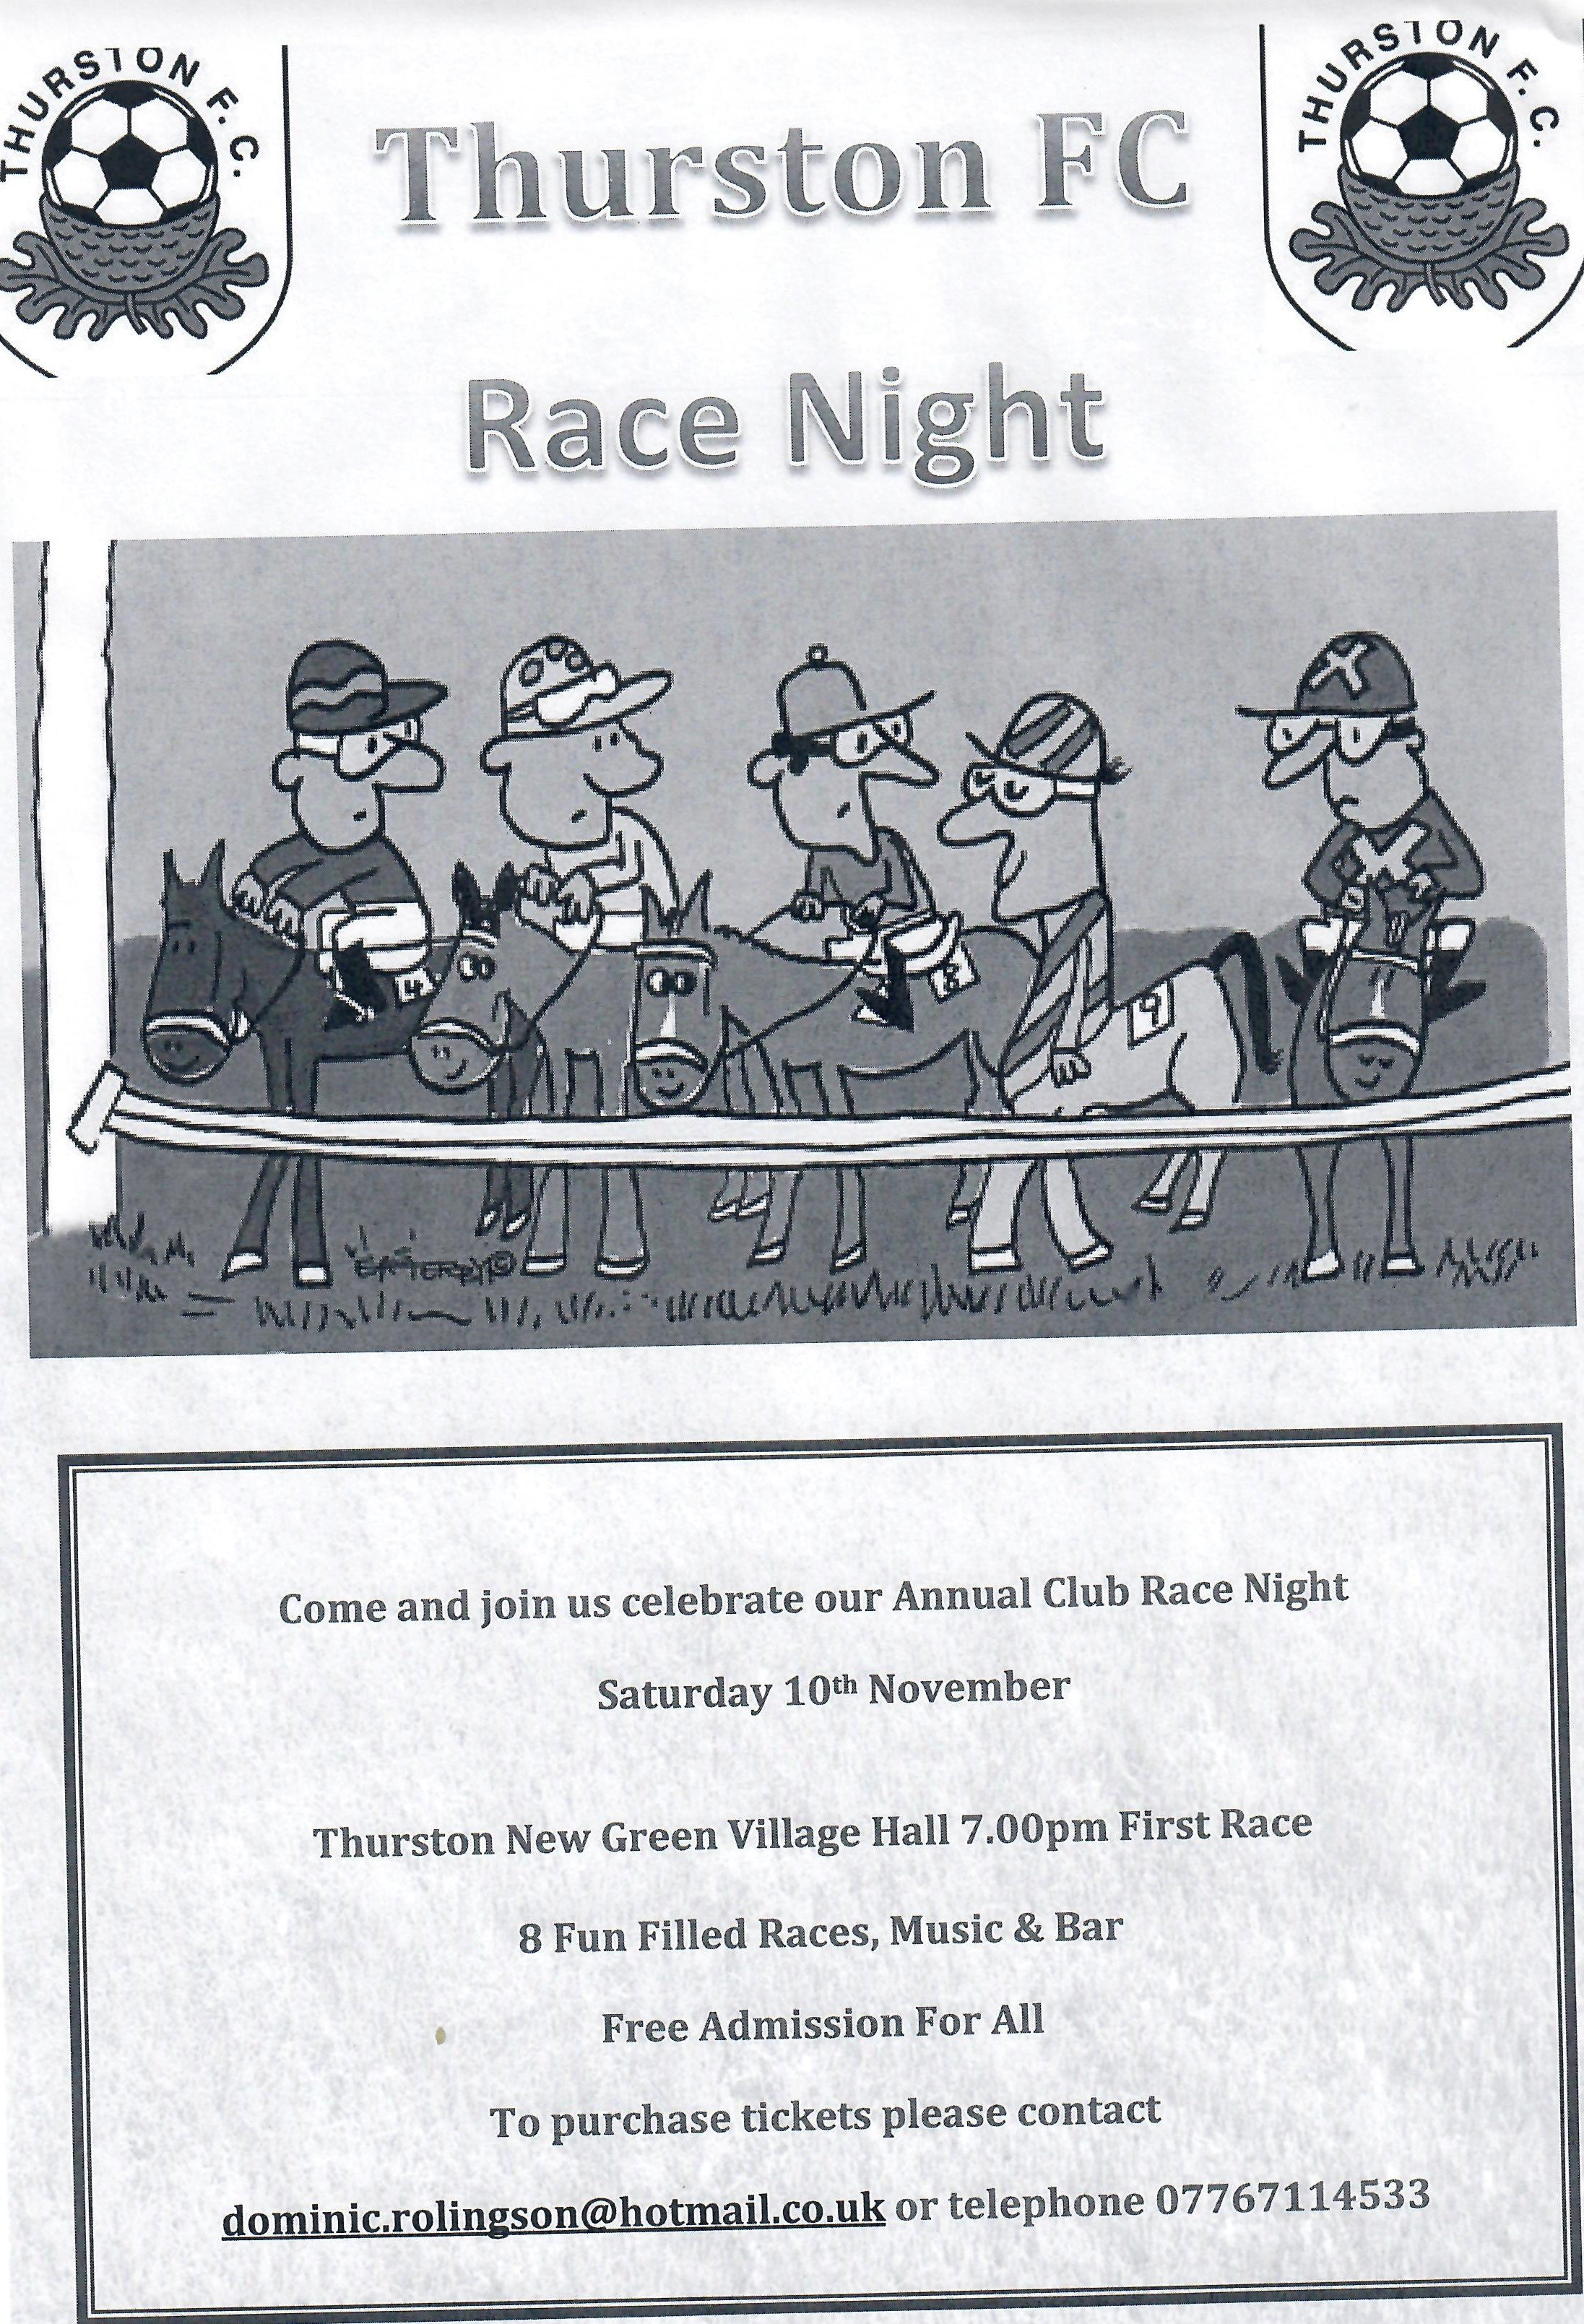 https://0201.nccdn.net/4_2/000/000/046/6ea/race-night-updated-2193x3217.jpg